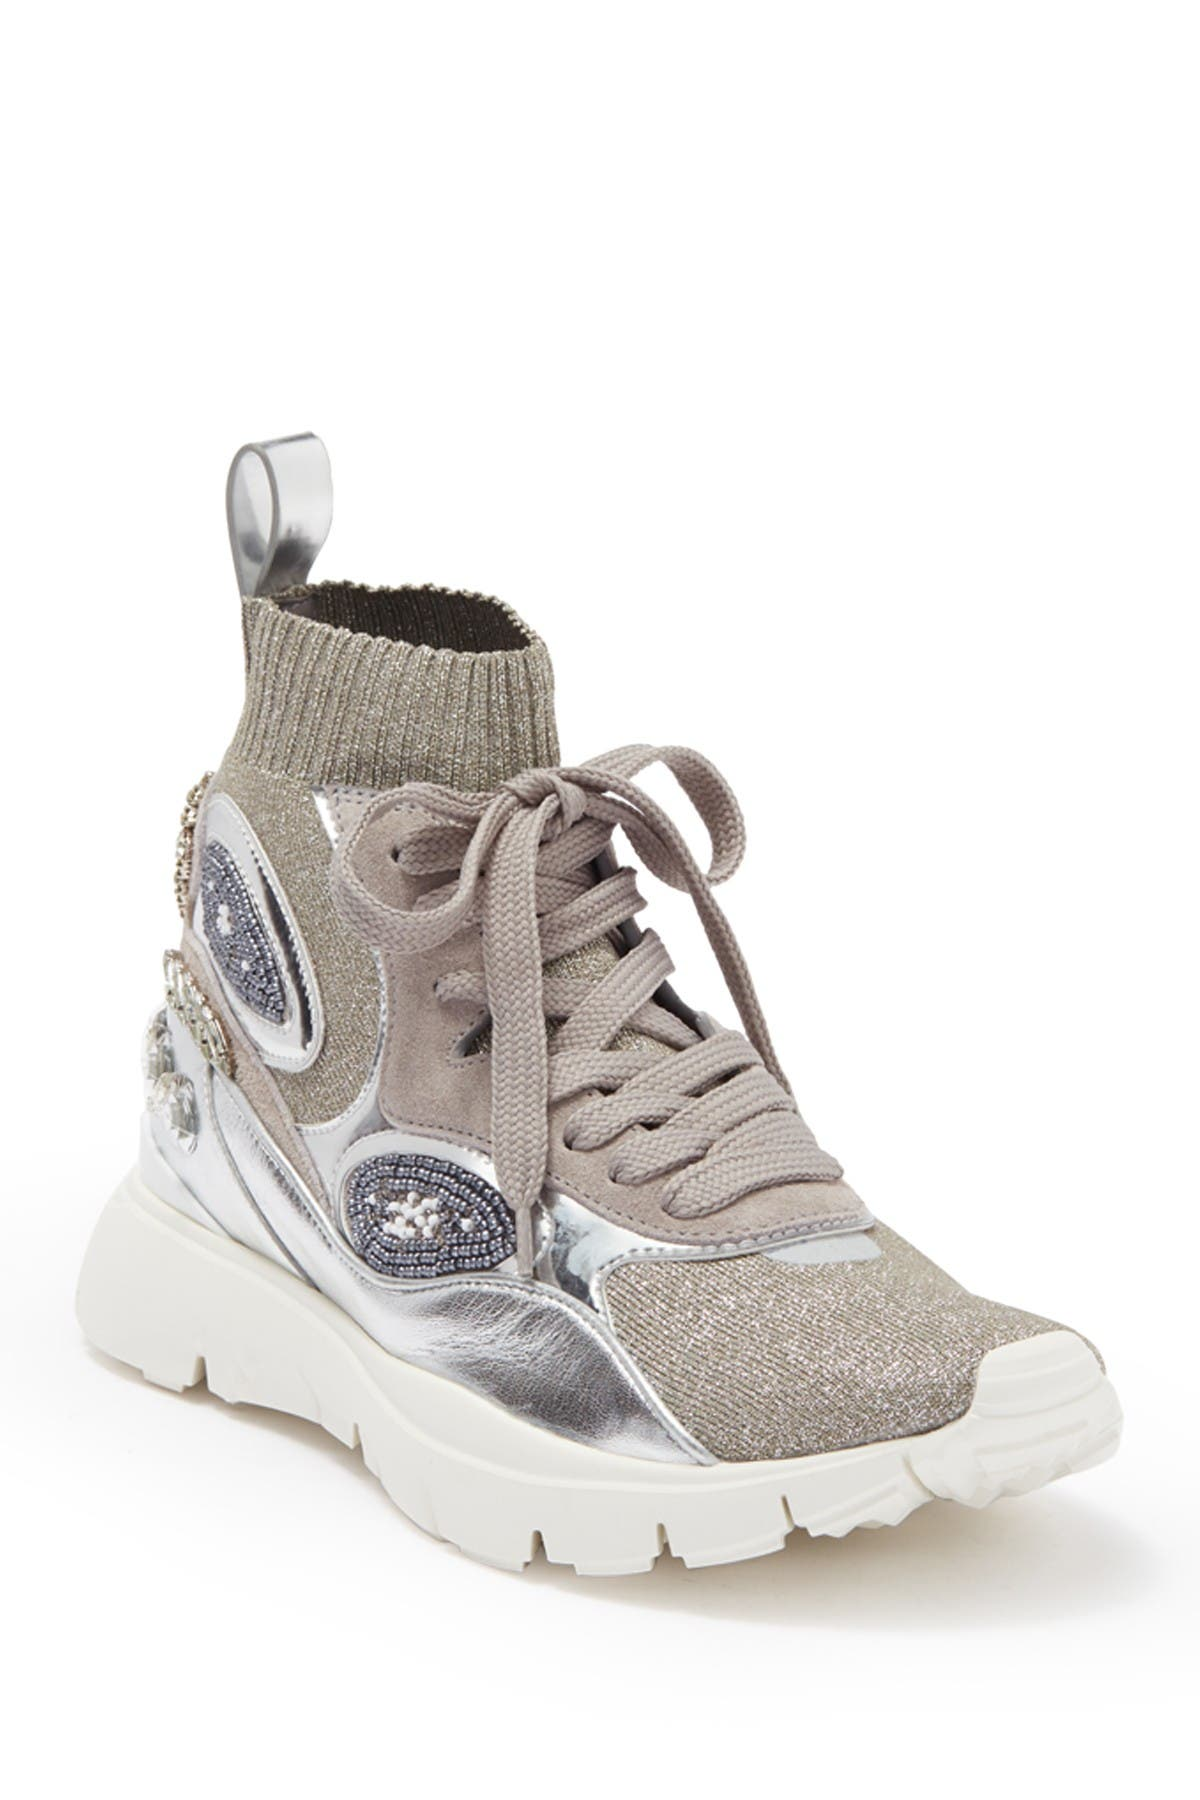 Image of Valentino Embellished Stretch Sneaker